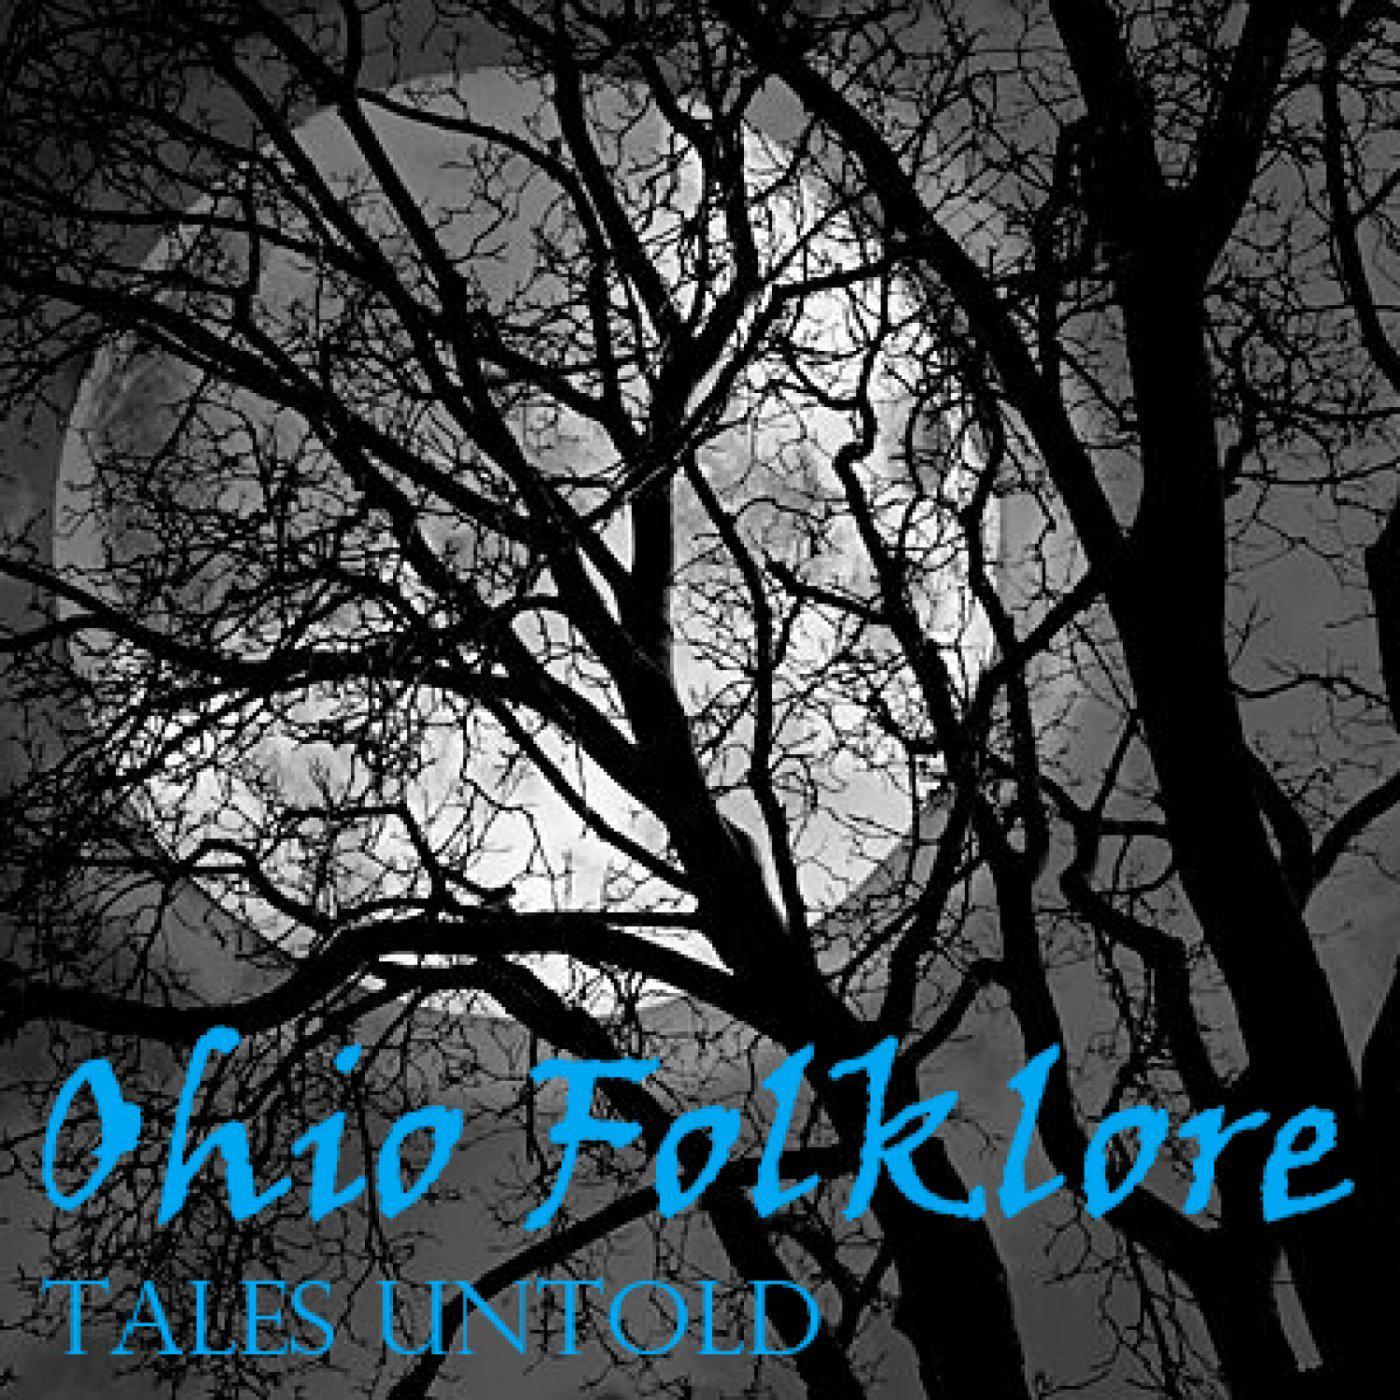 Ohio Folklore (podcast) - Melissa Davies | Listen Notes